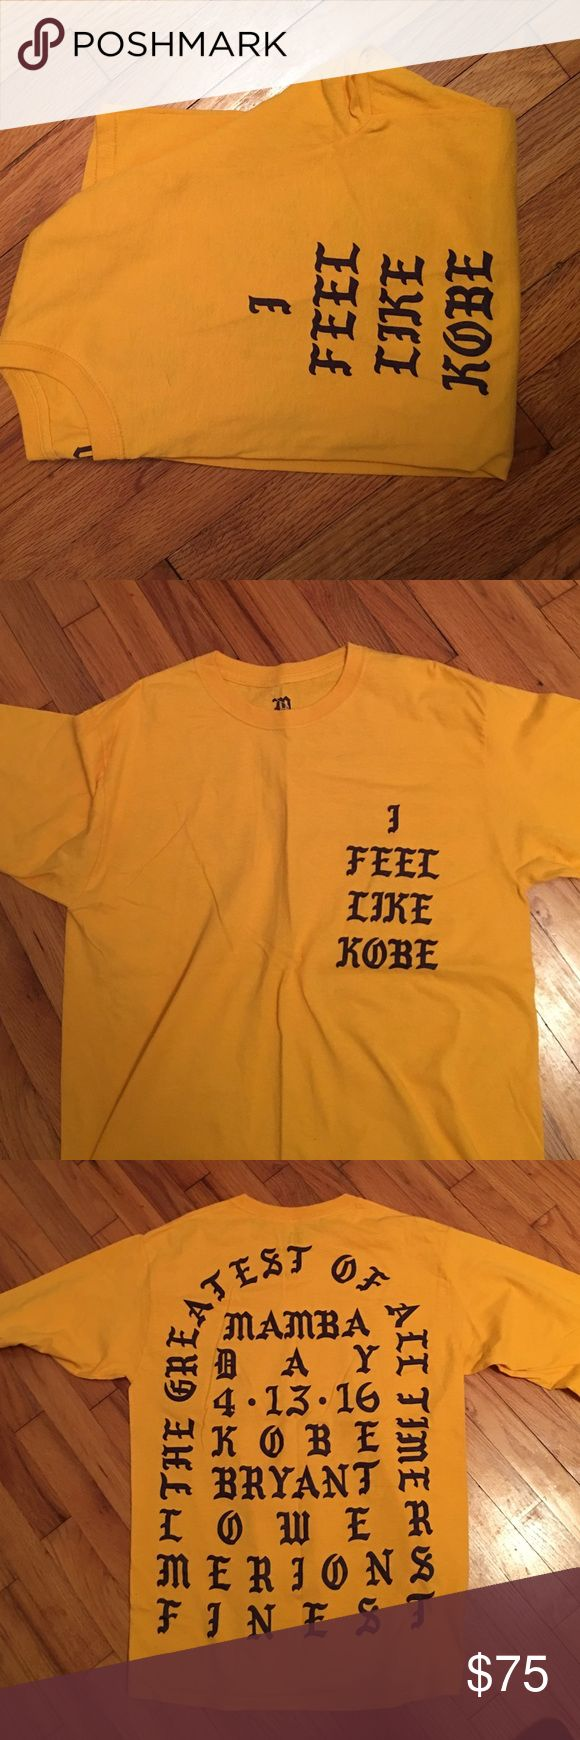 I Feel Like Kobe Yeezy Long Sleeve Shirt Long sleeve I Feel Like Kobe Shirt. Made by Kanye West for Kobe's last game. Part of the Pablo/ Yeezy clothing line. 100 percent authentic purchased from Kanye West's Website. Size medium. Washed once, never worn. Yeezy Shirts Tees - Long Sleeve